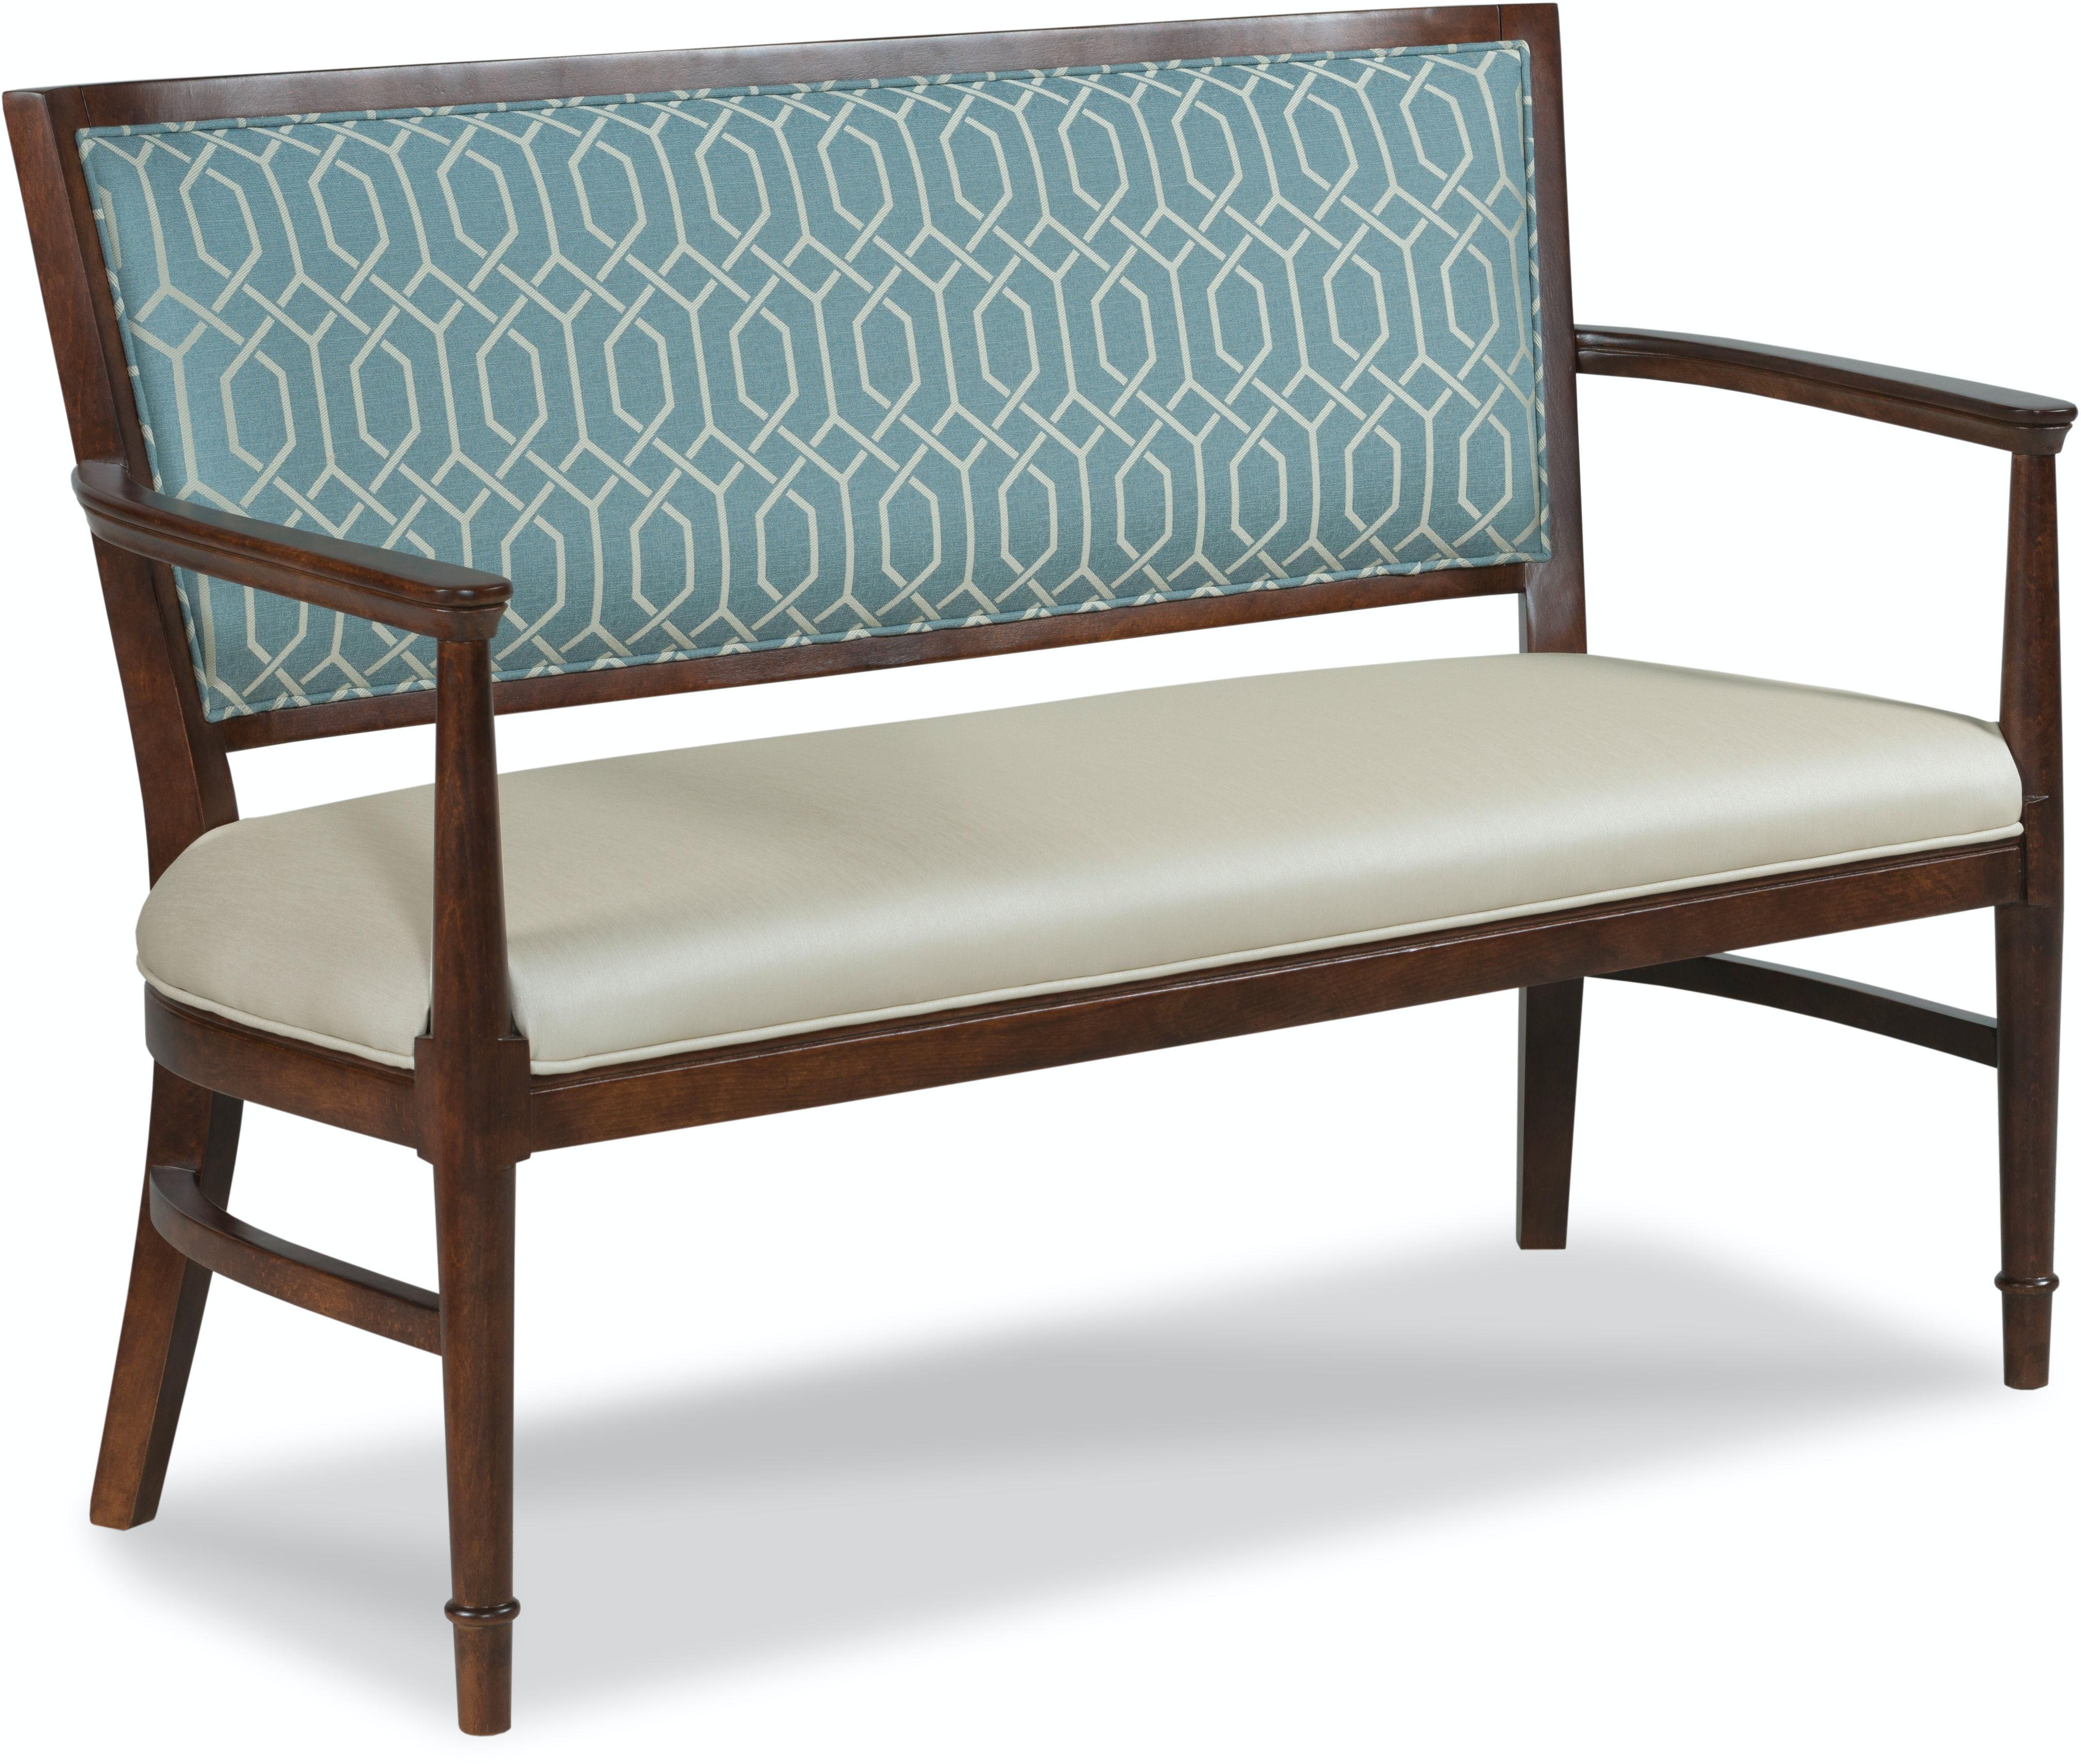 Fairfield Chair Company Living Room Garland Settee 8747 40